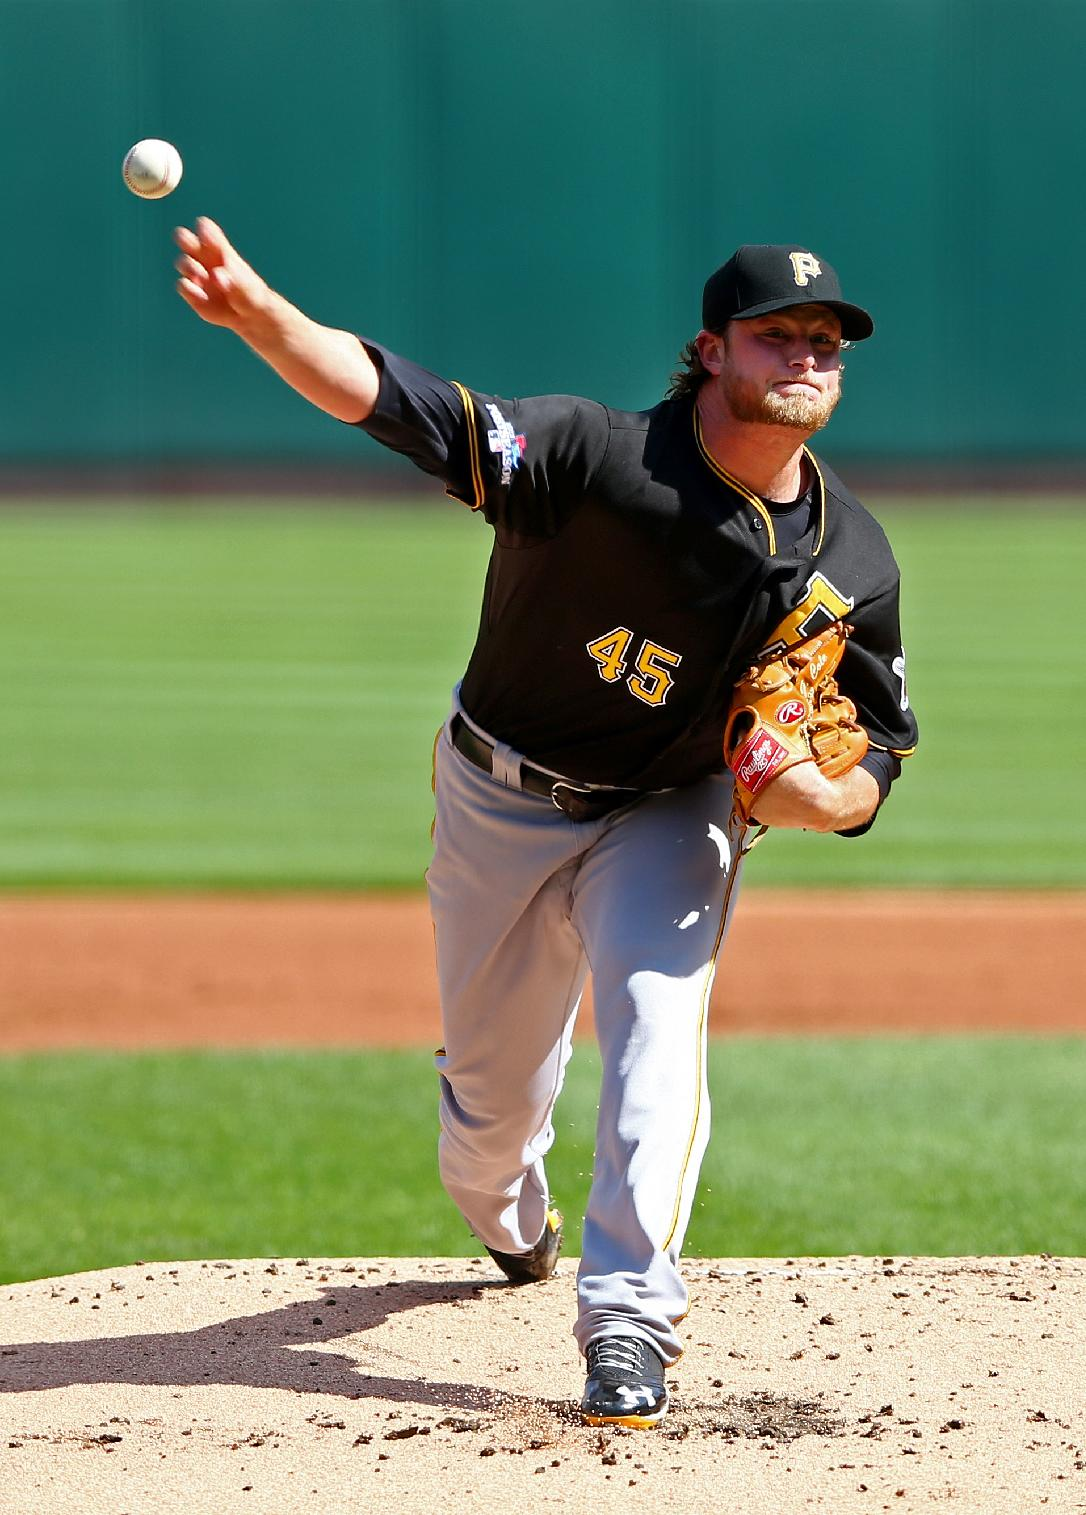 Cole silences Cardinals, Pirates tie series